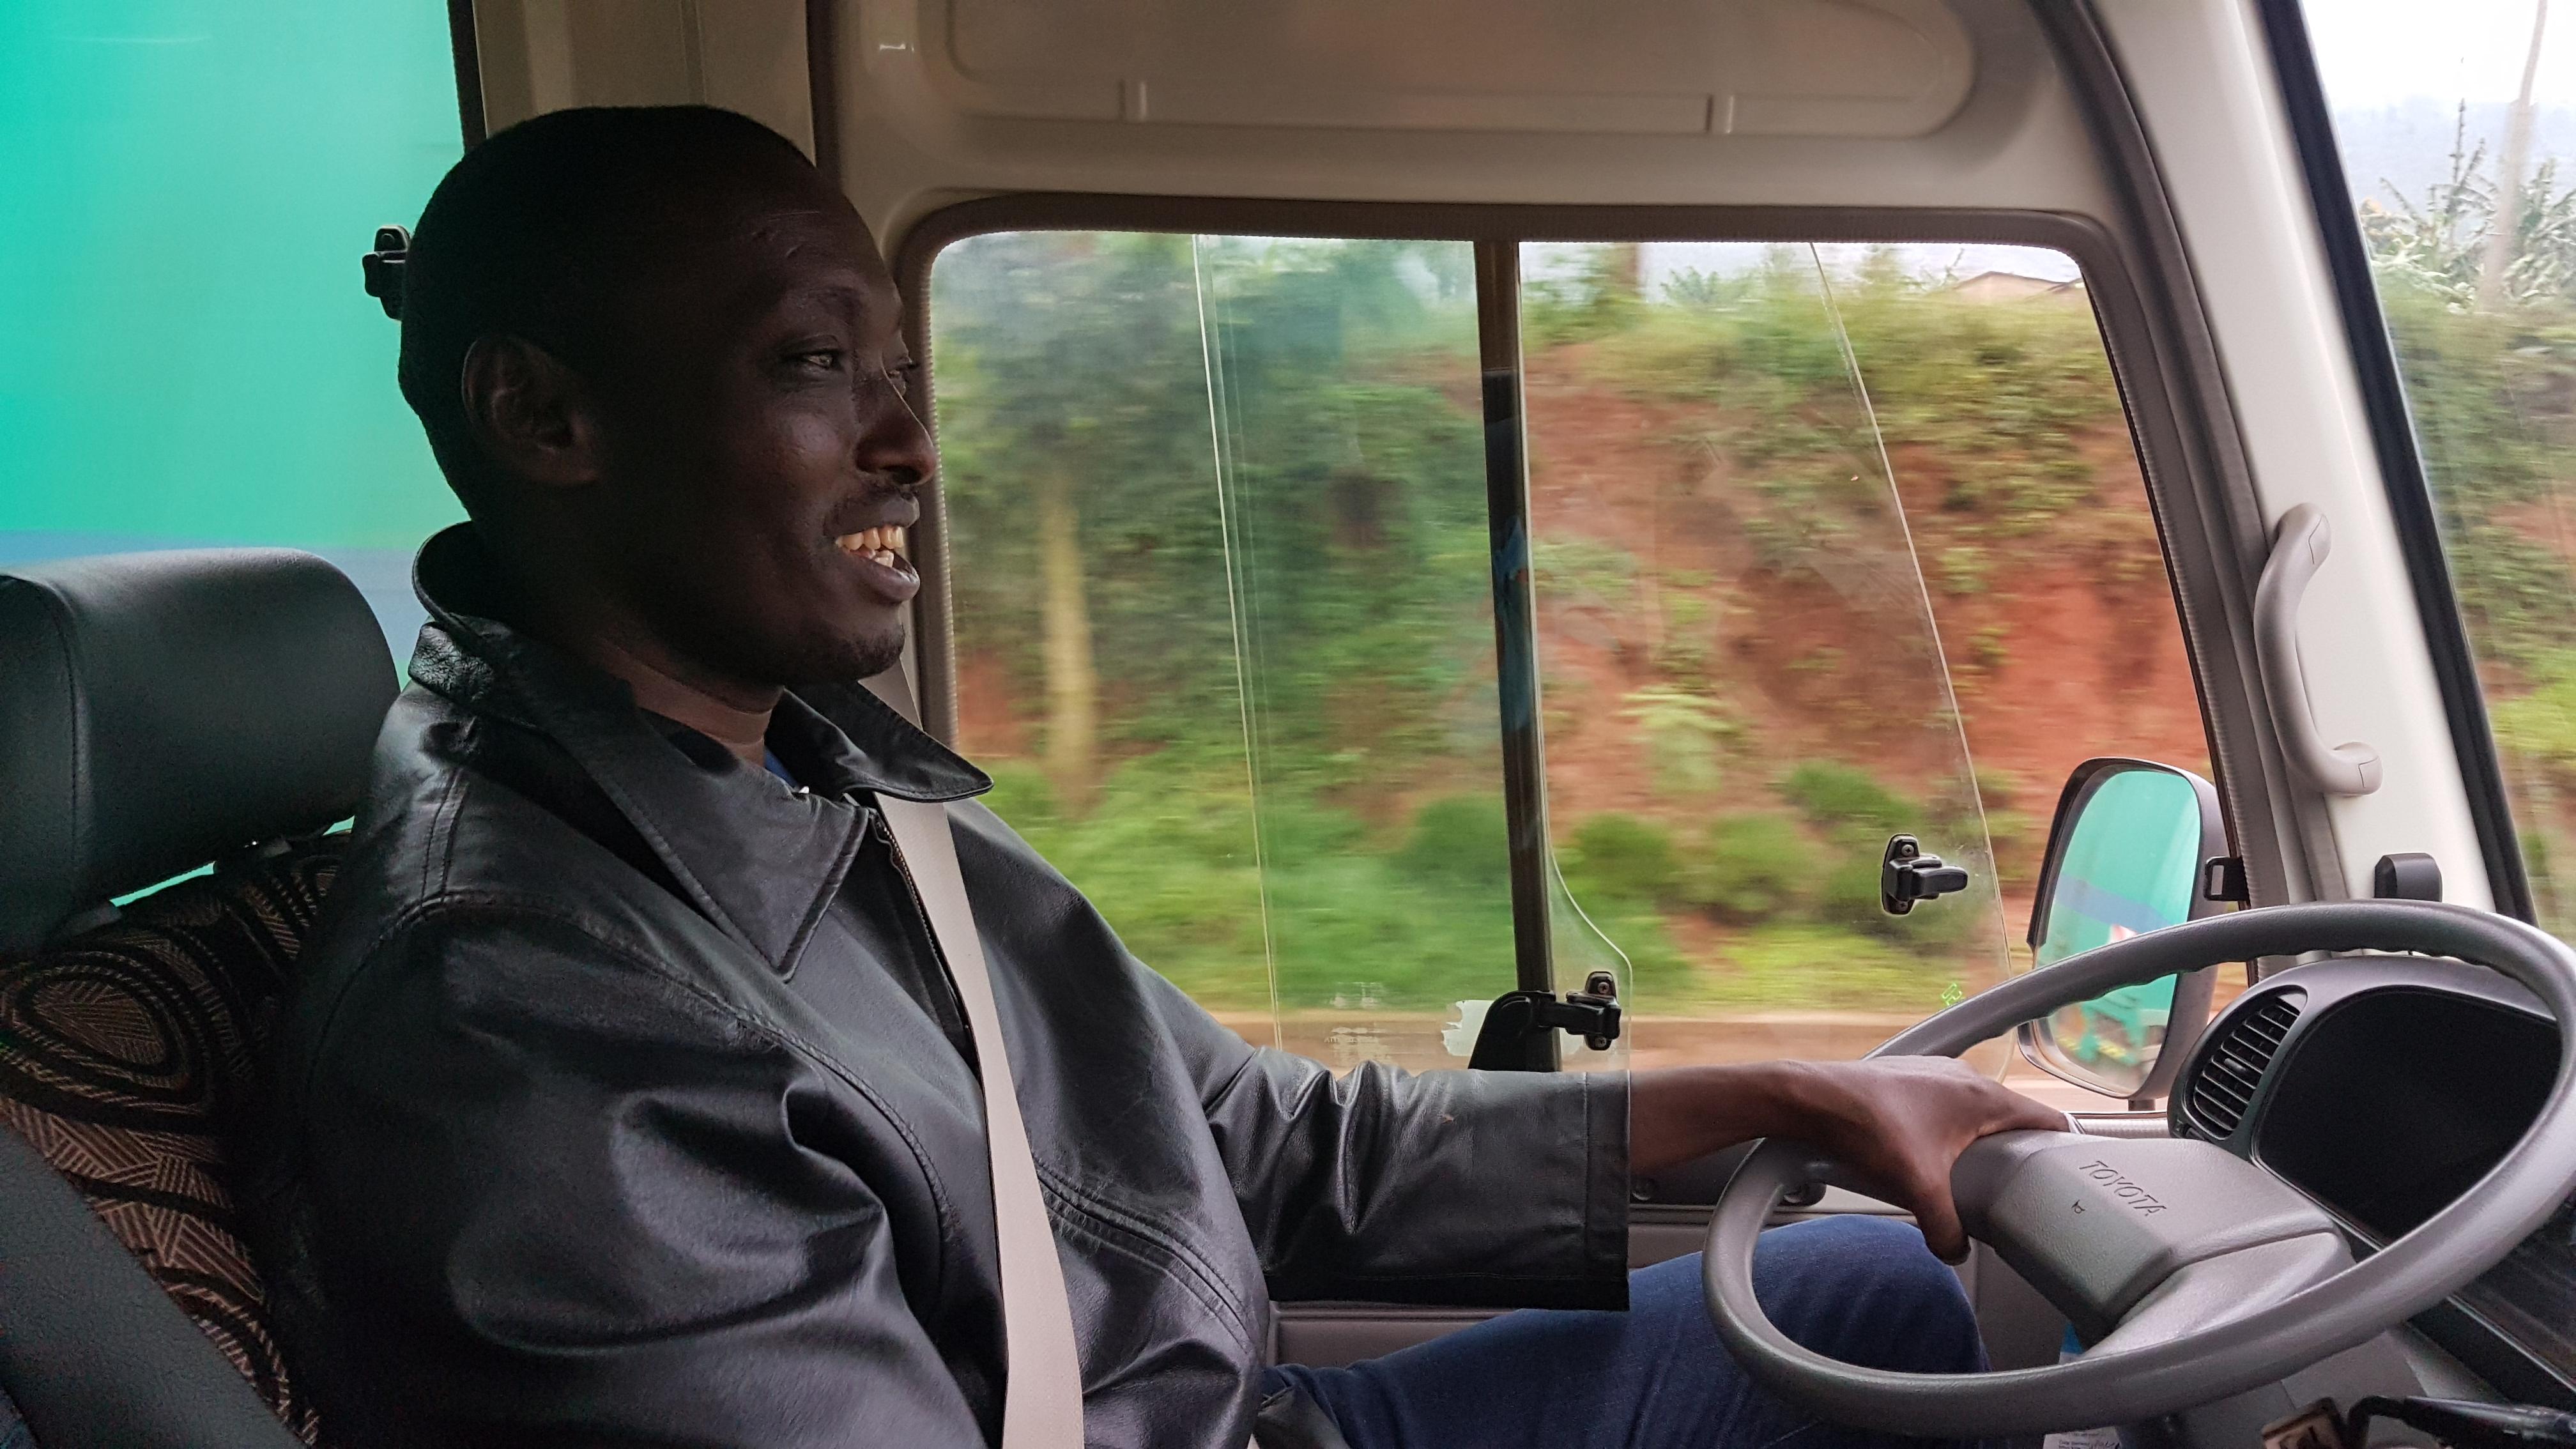 File:Bus Driver in Kigali Rwanda.jpg — Wikimedia Commons